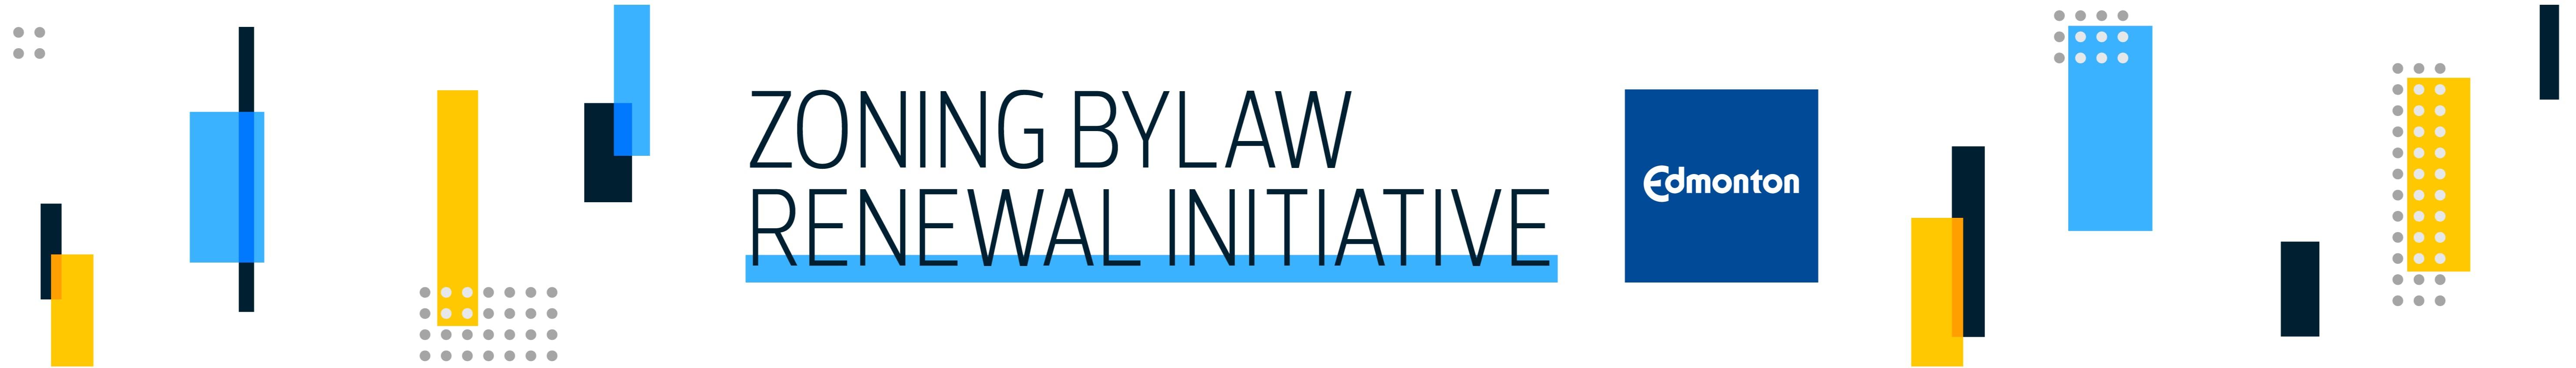 Zoning Bylaw Renewal Initiative